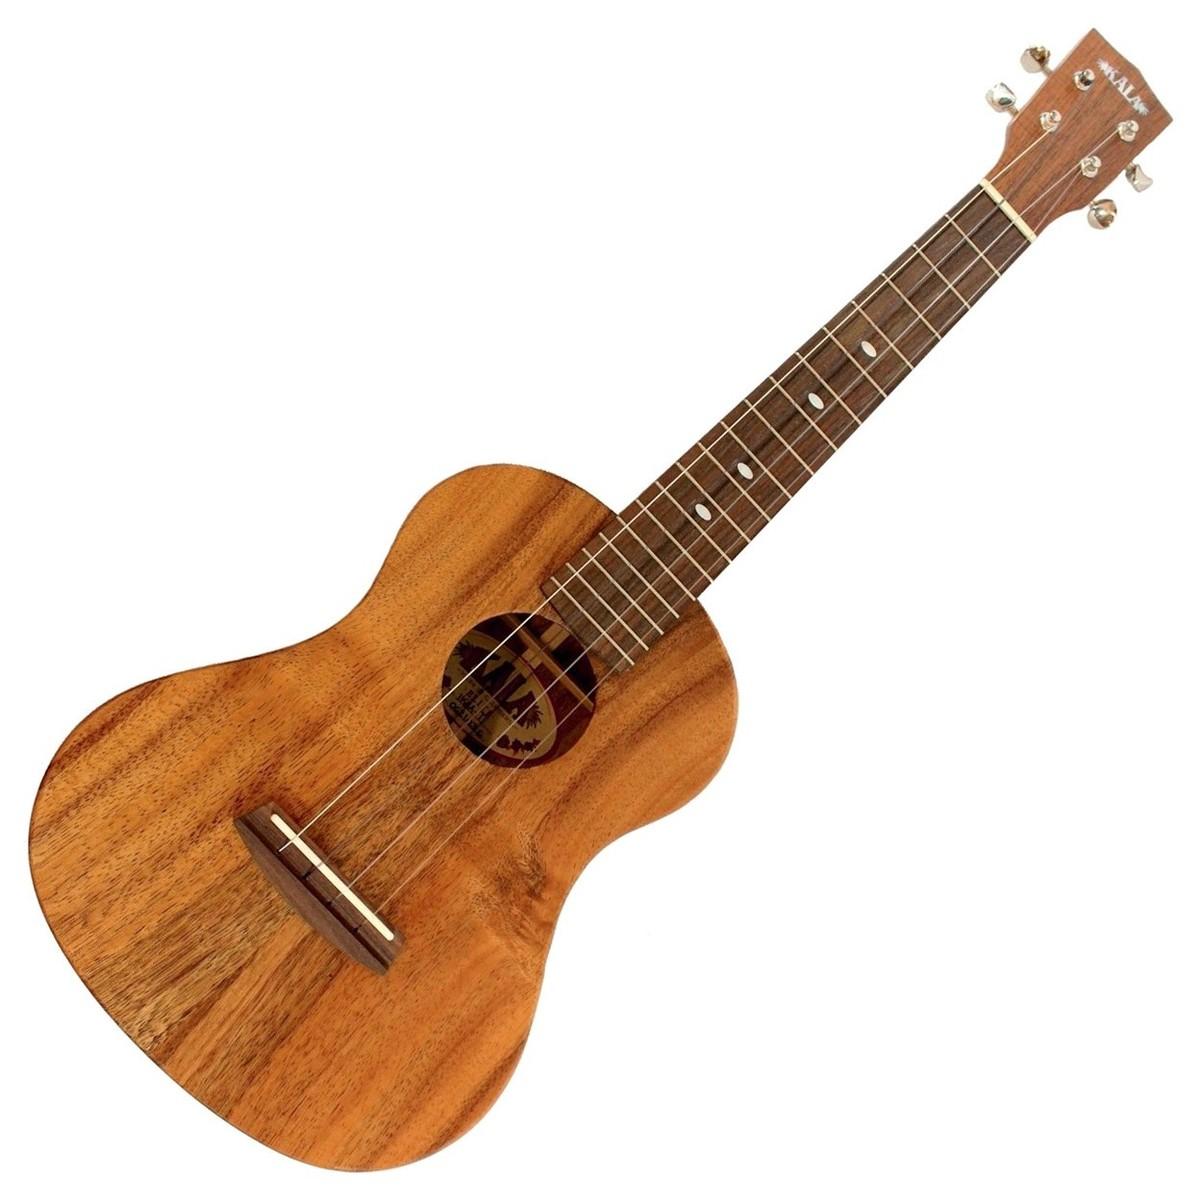 kala elite series koa 1 tenor ukulele satin natural at. Black Bedroom Furniture Sets. Home Design Ideas